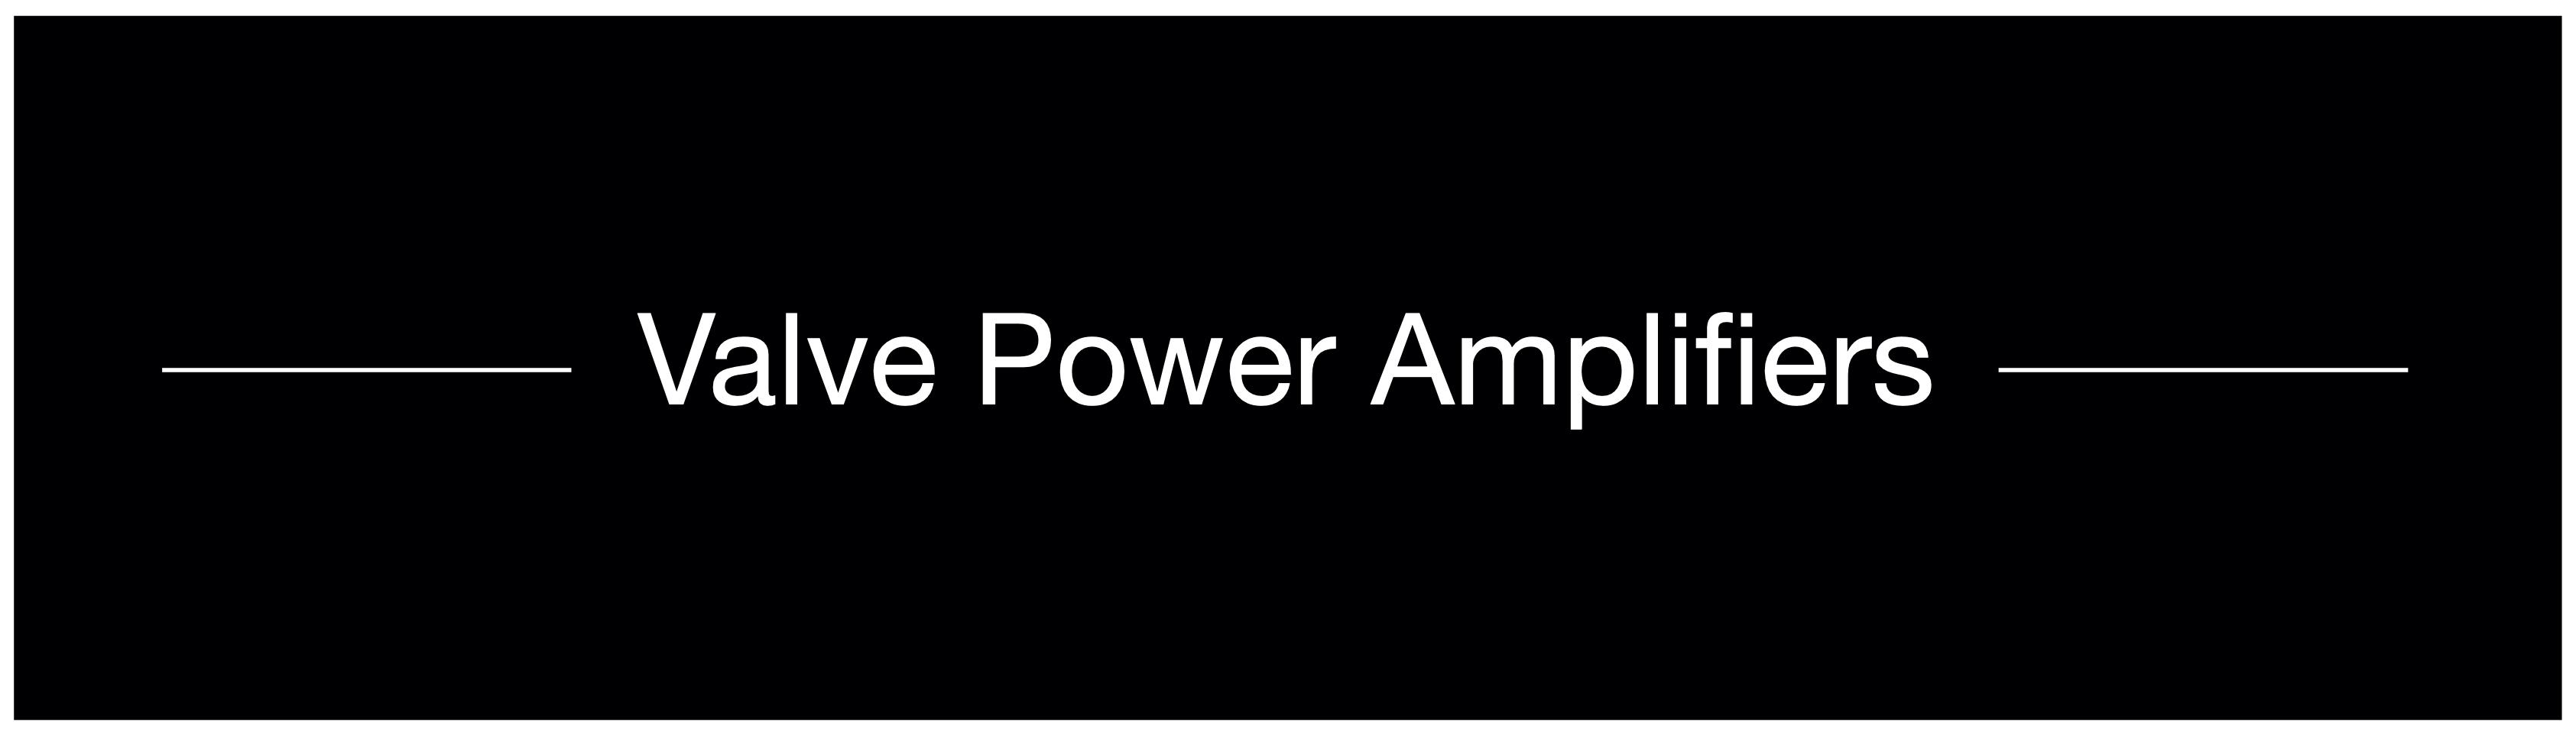 valve-pwr-amps.jpg